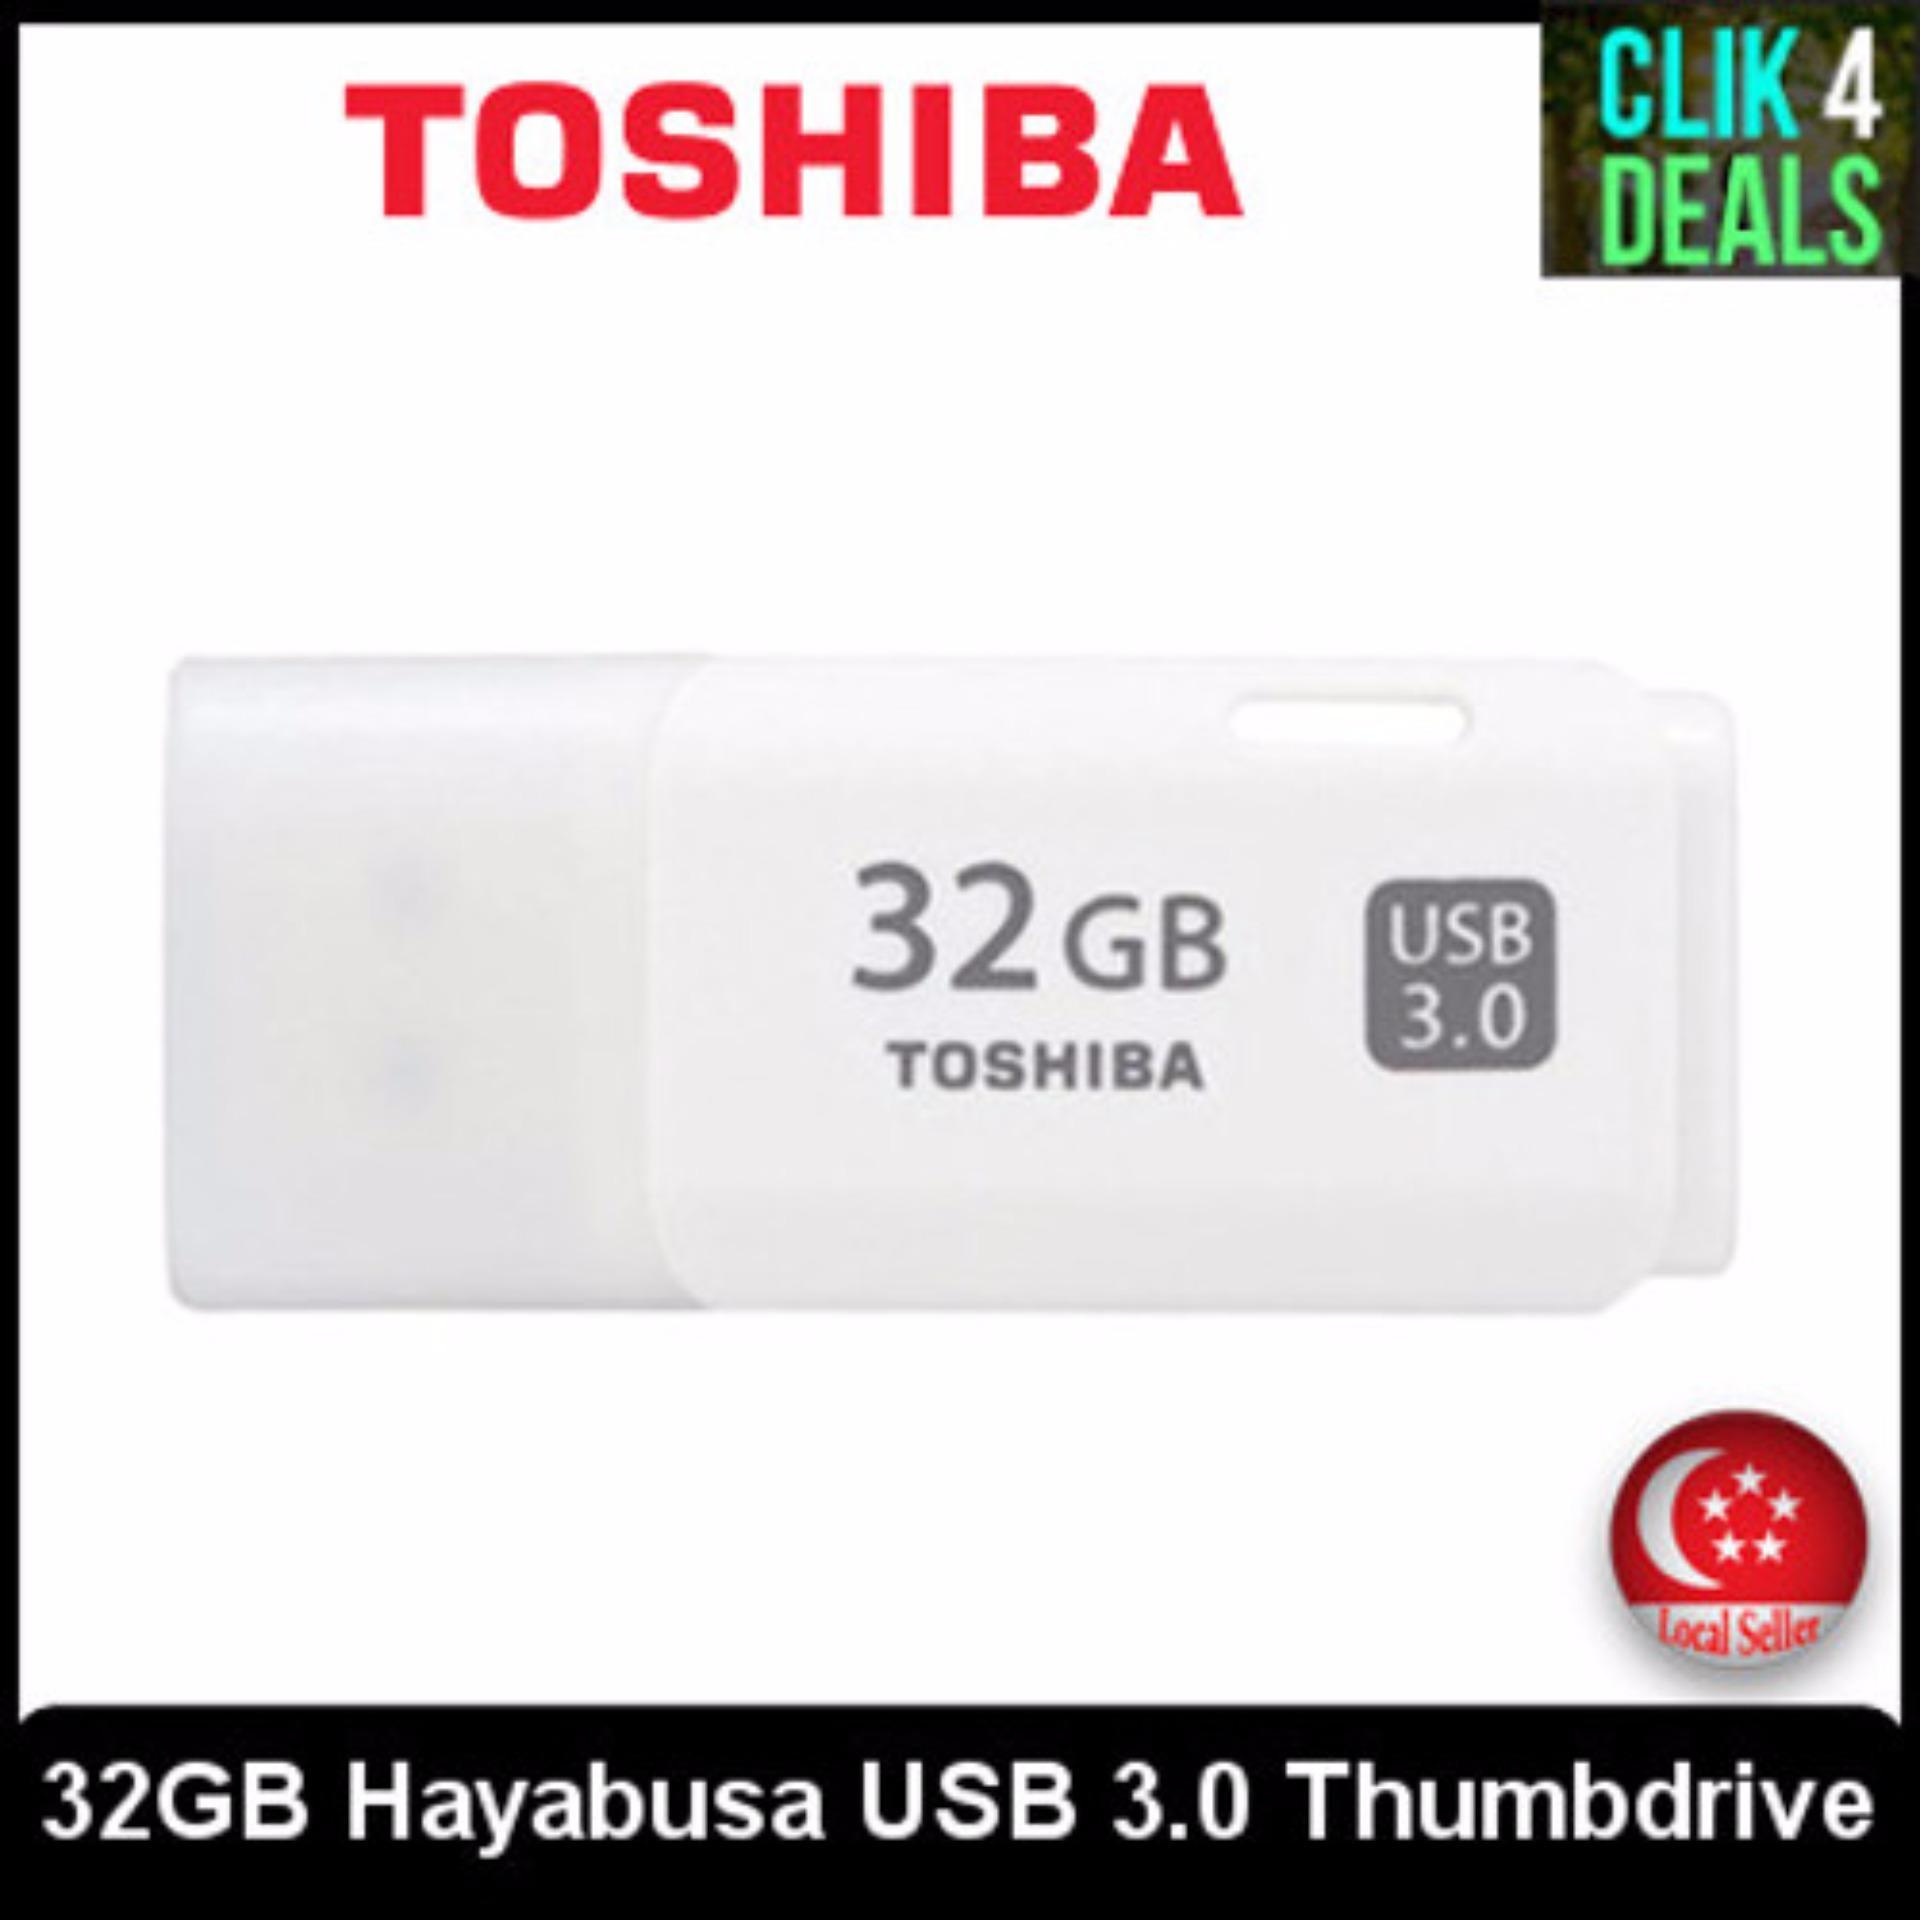 Toshiba Transmemory U301 32gb Usb Thumbdrive Flash Drive Memory Disk 32 Gb Hayabusa Original Local Set Singapore